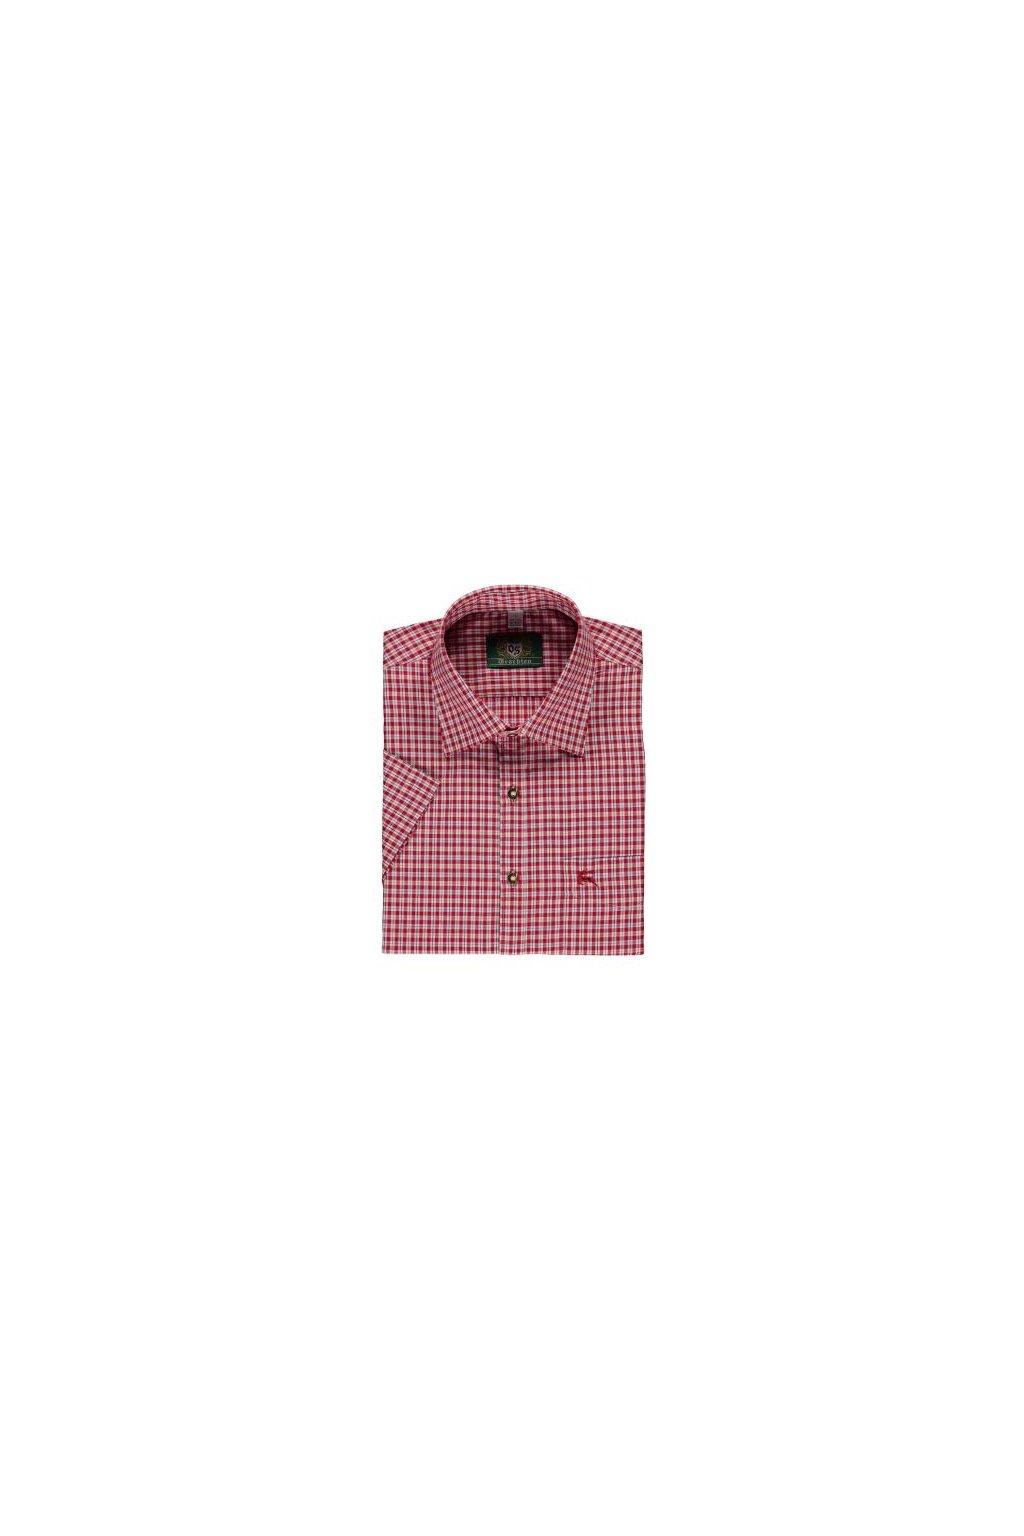 ORBIS - Košile pánská s kr.r. červená (3729)